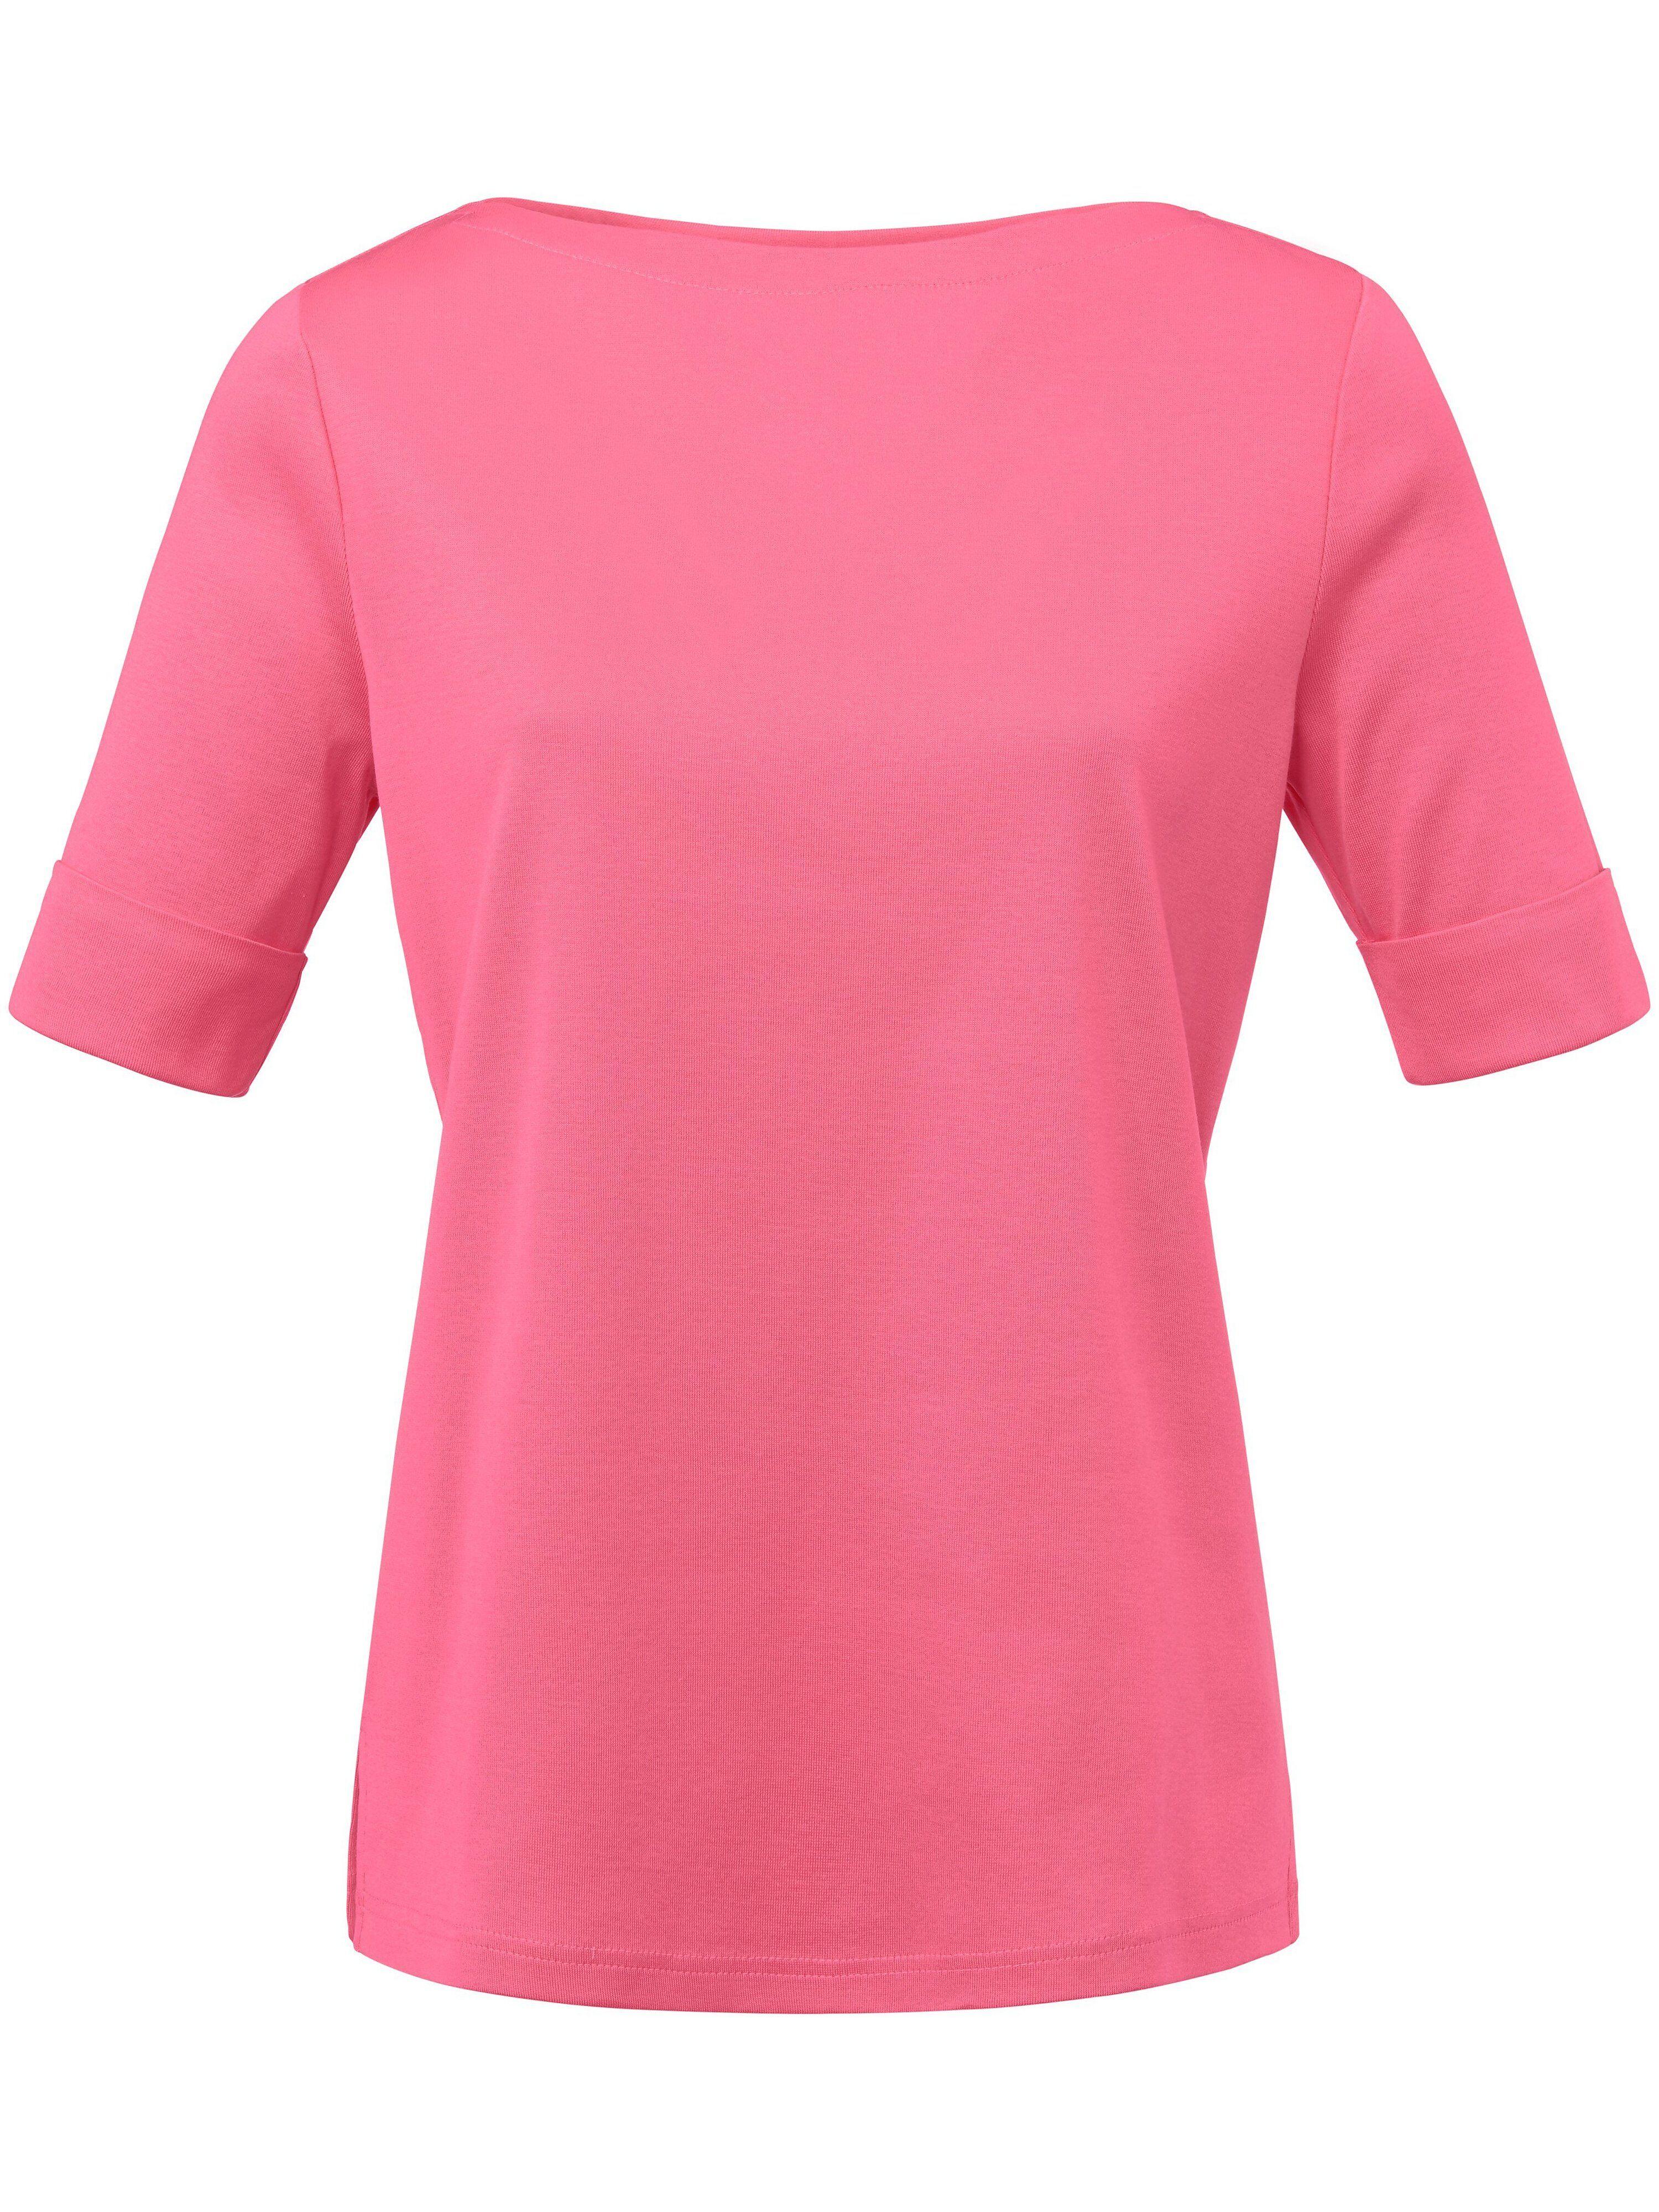 Efixelle Le T-shirt 100% coton  Efixelle fuchsia  - Femme - 38